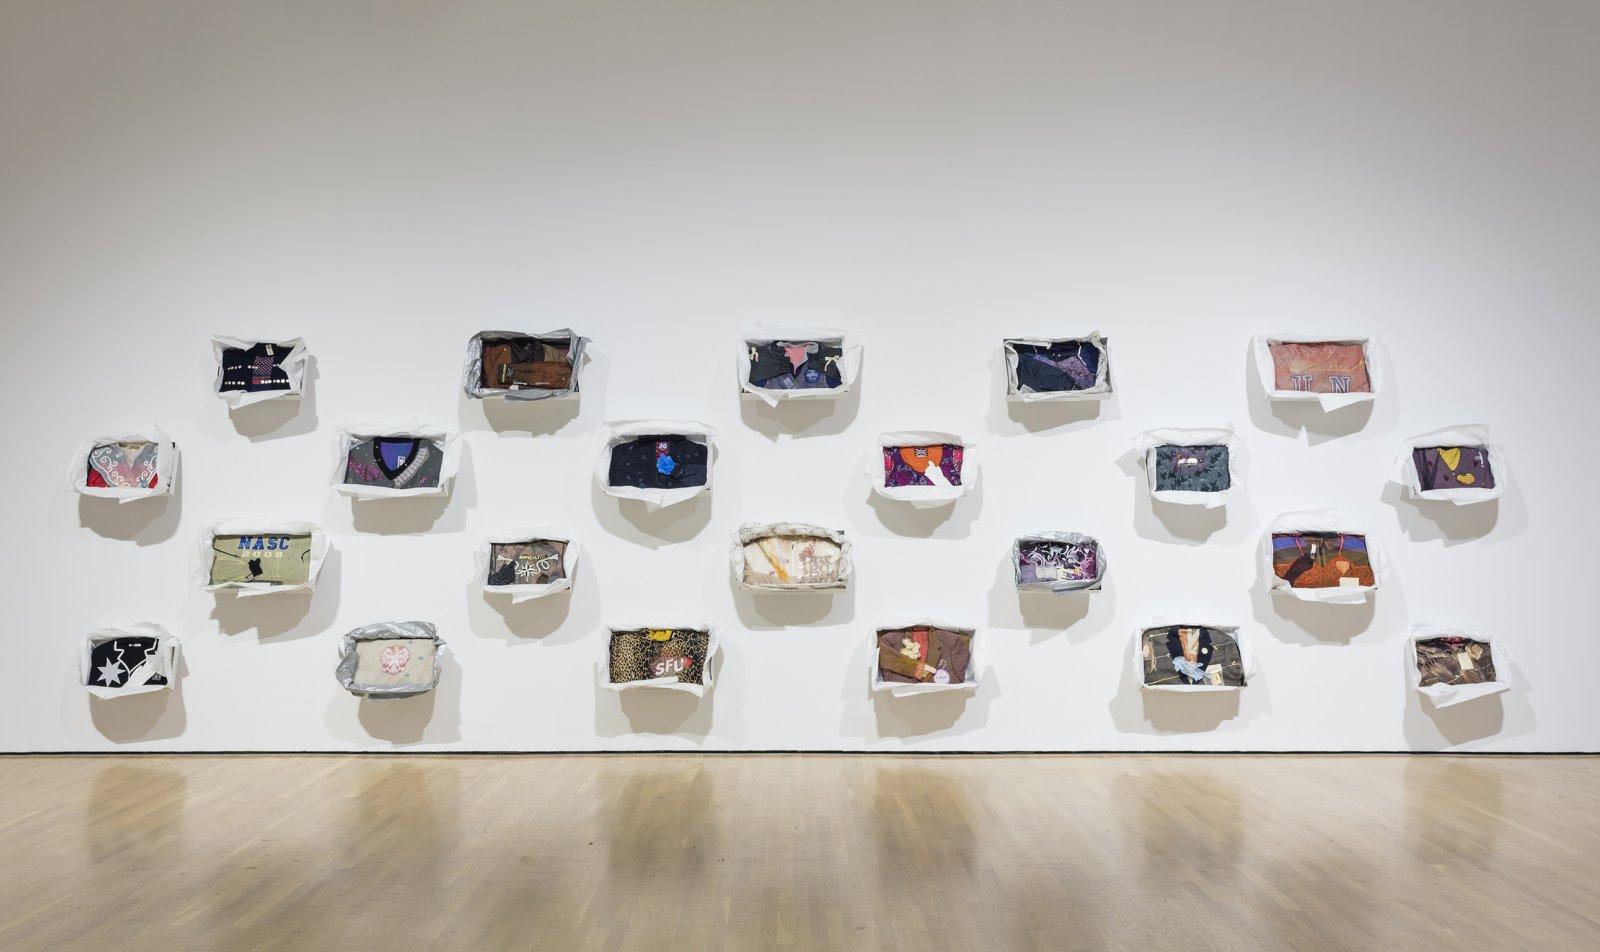 Liz Magor, Being This, 2012, 24 boxes, paper, textiles, found materials, each approximately 12 x 19 x 3 in. (31 x 48 x 6 cm). Installation view, Habitude, Musée d'art contemporain de Montréal, 2016 by Liz Magor